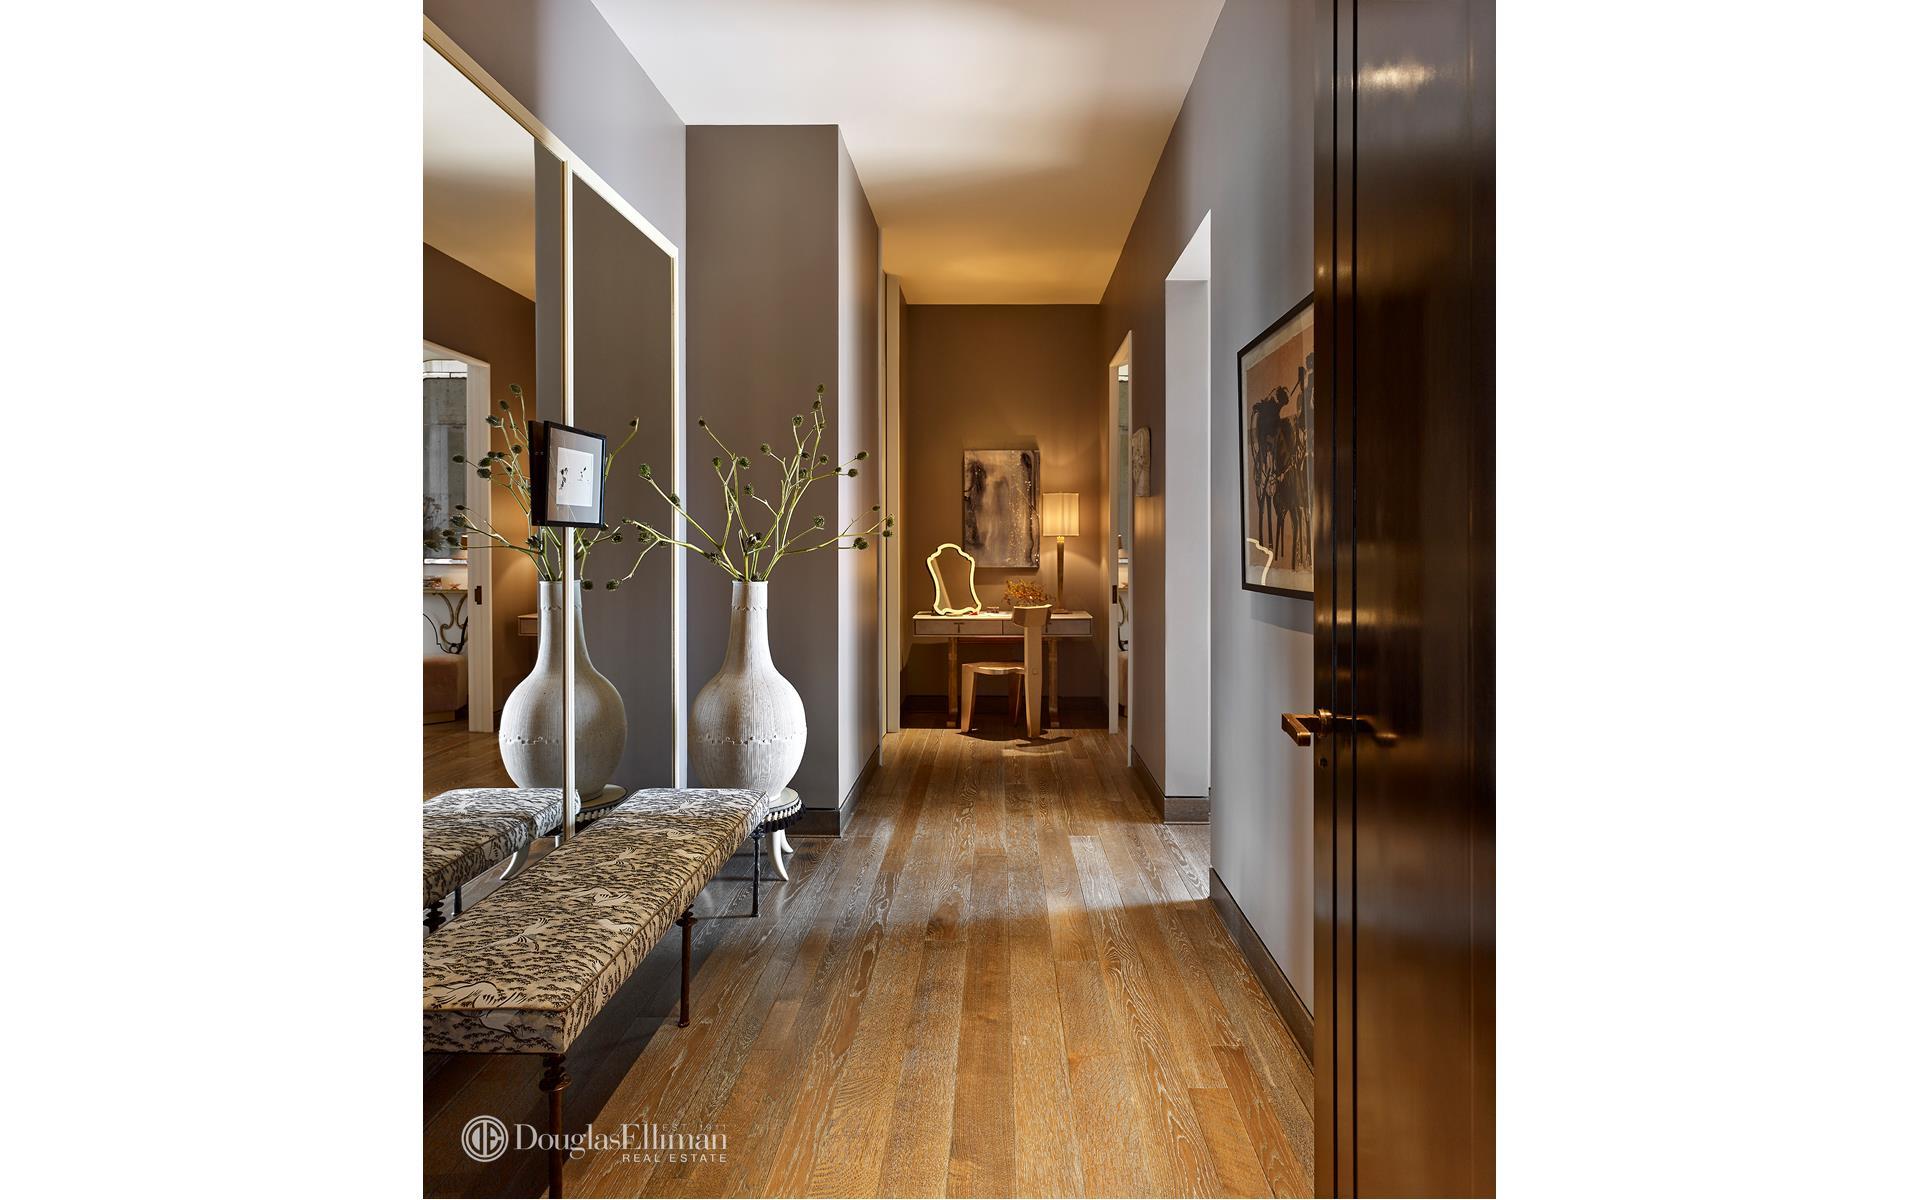 111 West 57th Street Interior Photo